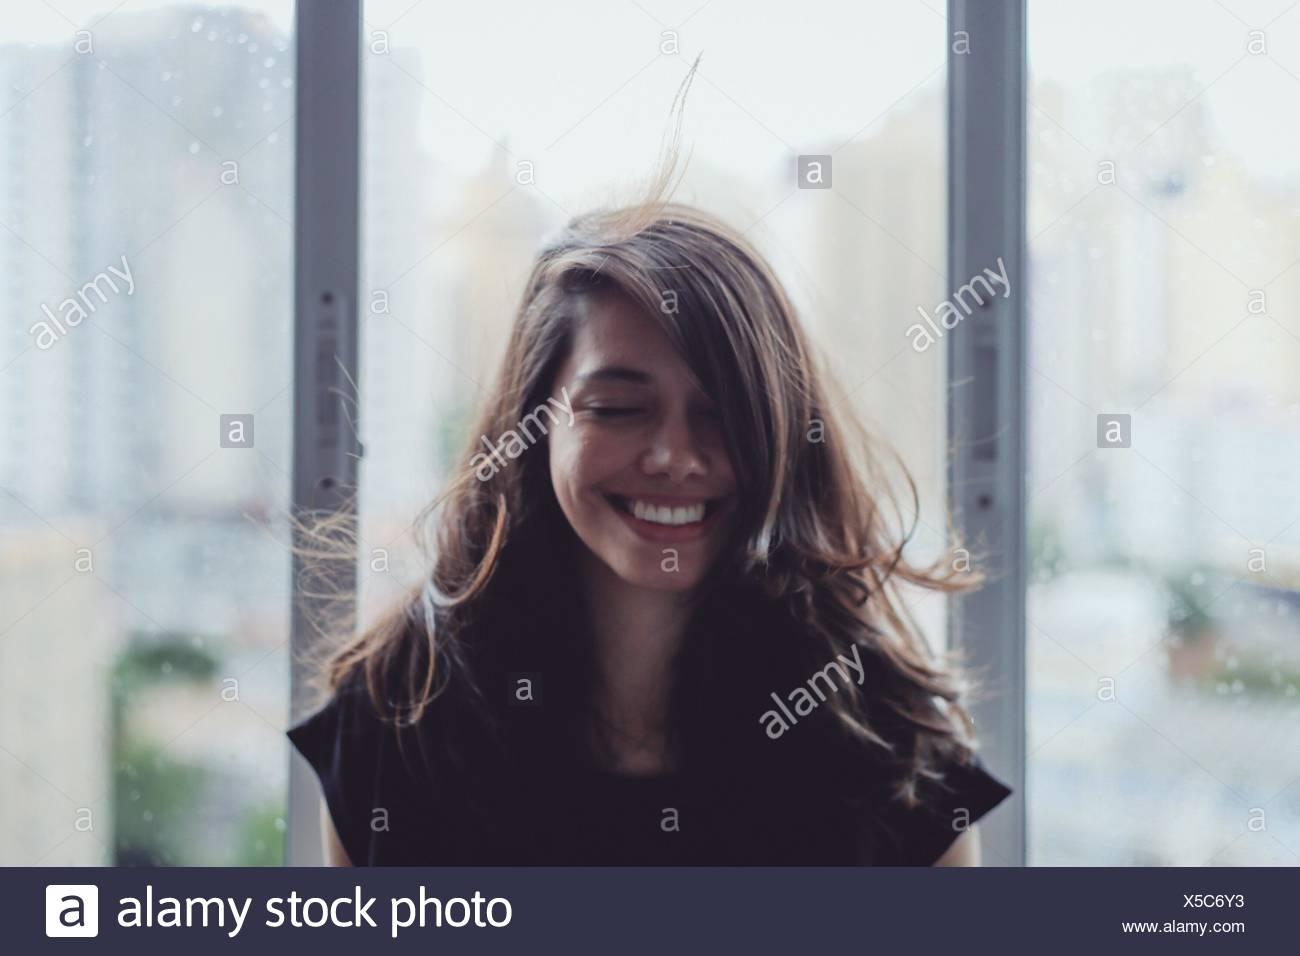 Porträt einer jungen Frau Stockbild